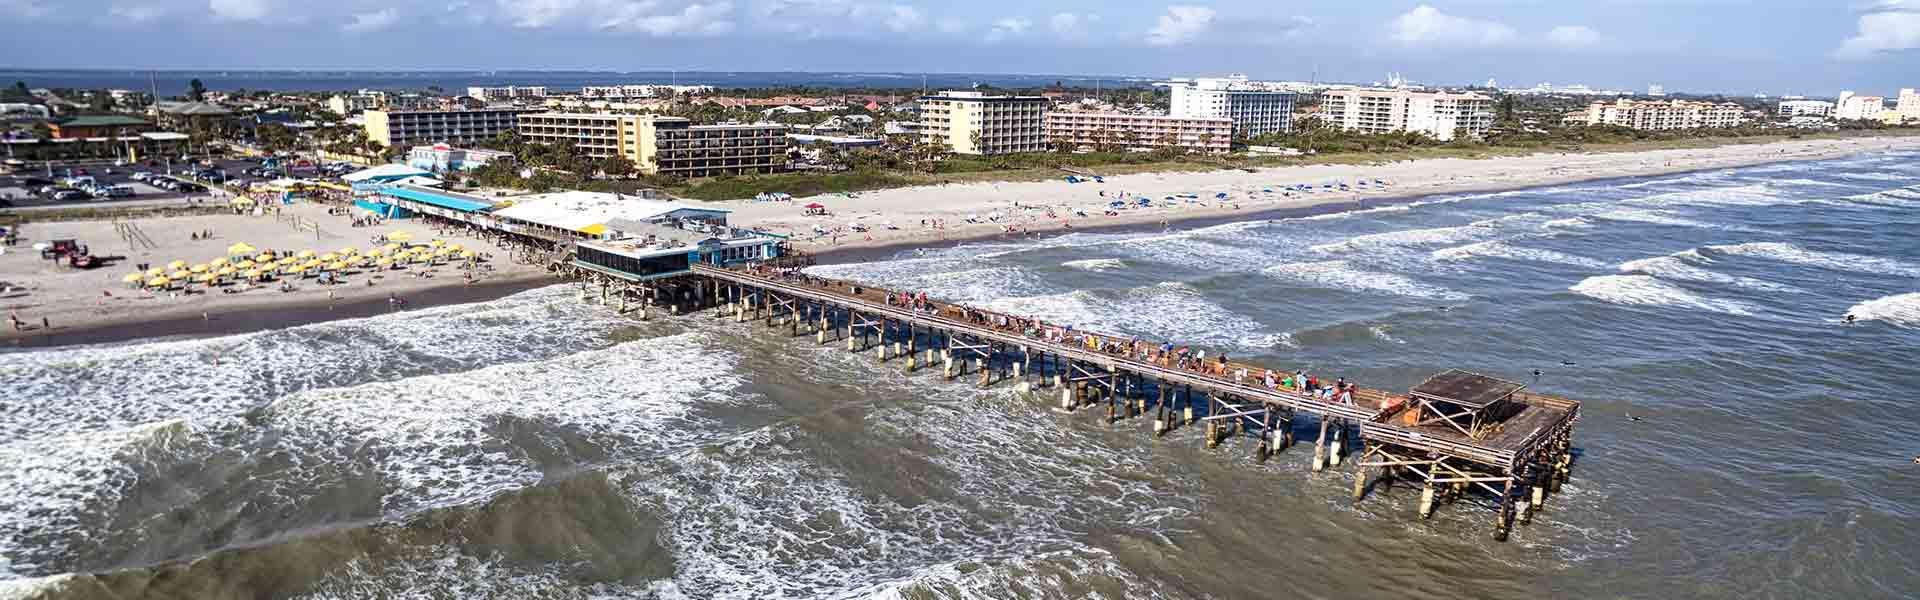 MarionCountySchoolDistrictt-Public-FL-Beach-Banner-2021